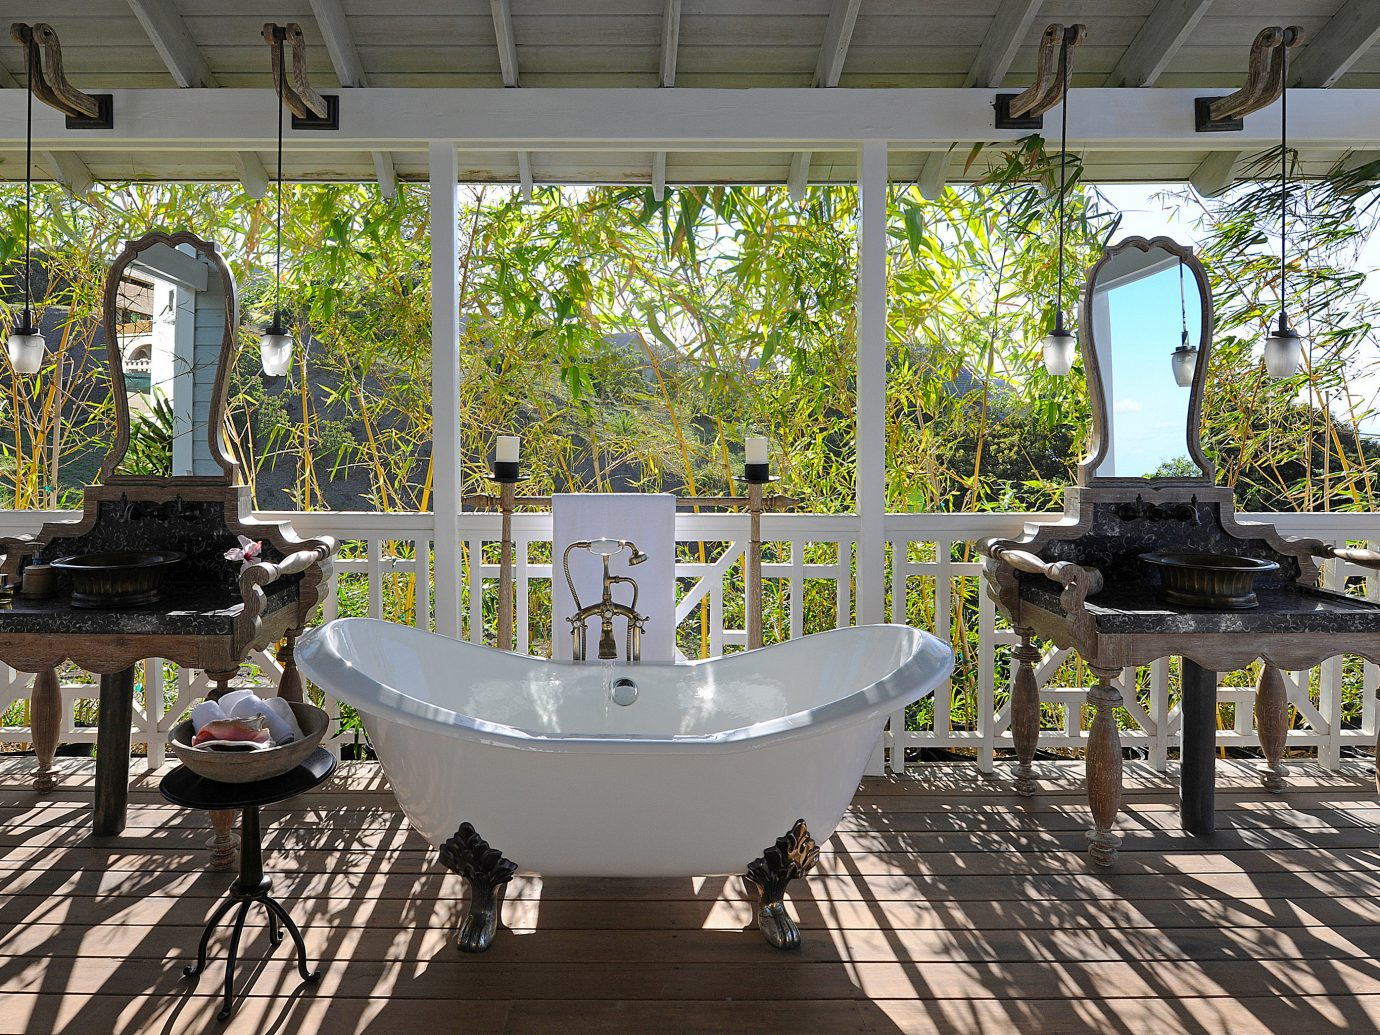 Hotels Trip Ideas indoor property room estate home porch cottage interior design backyard mansion outdoor structure Villa Courtyard swimming pool furniture Bath